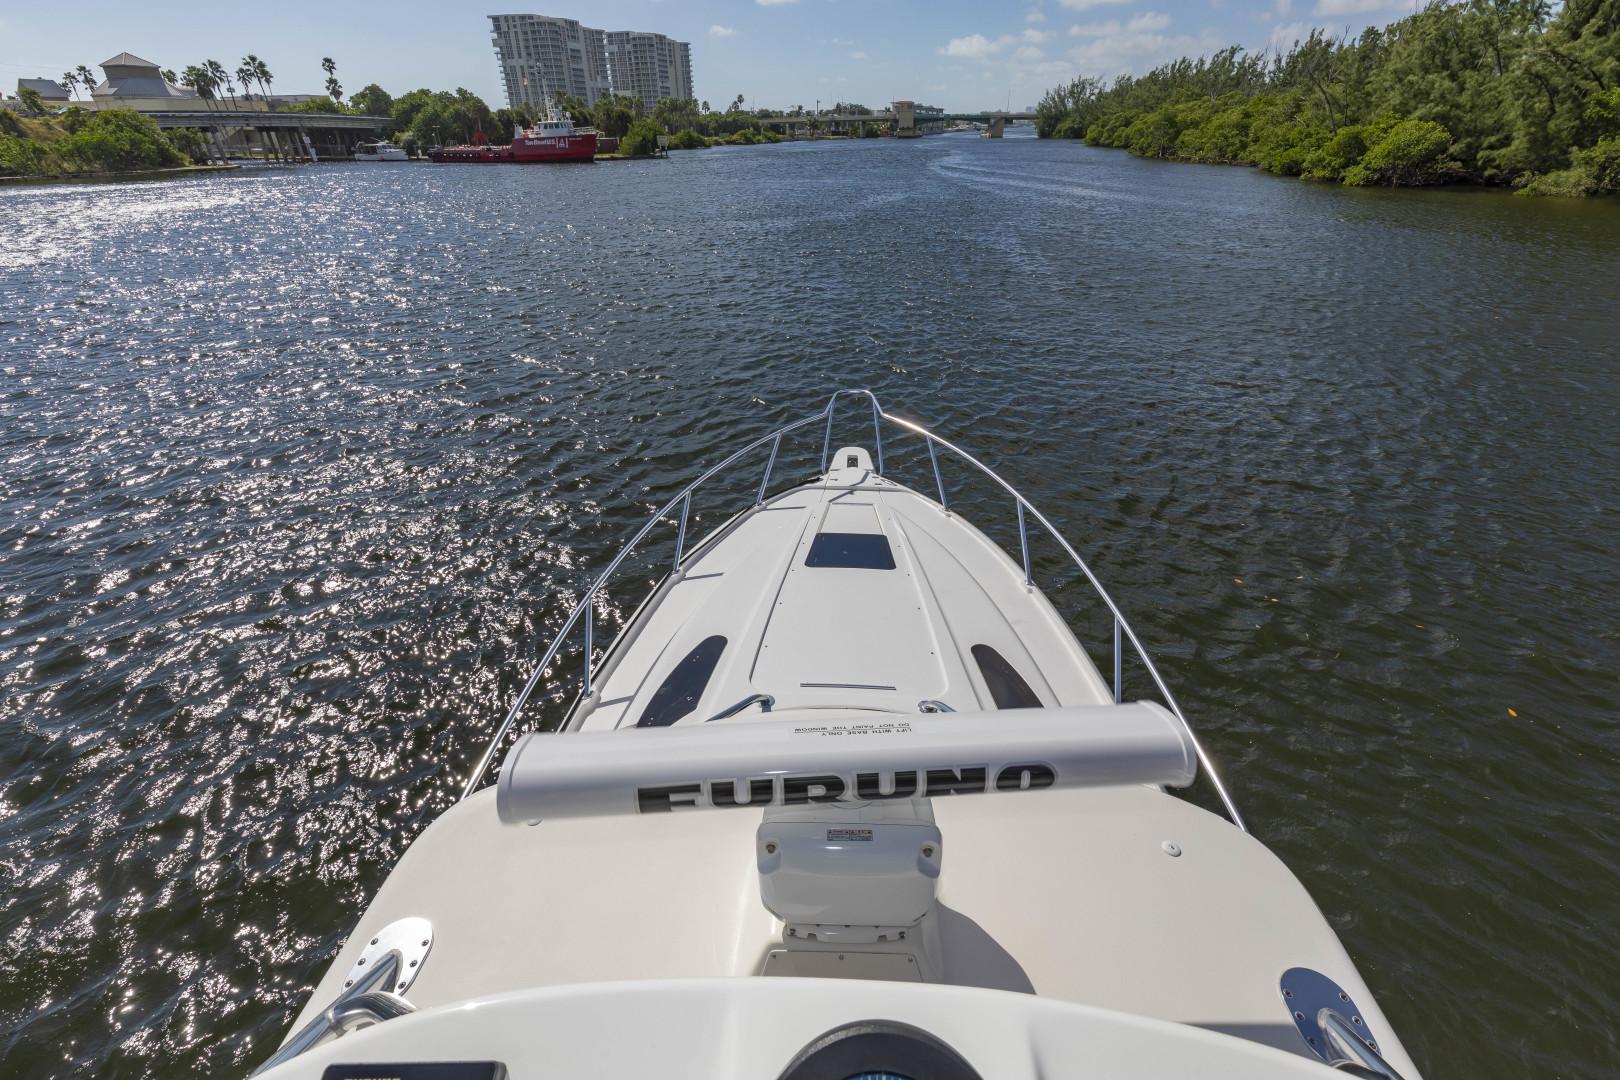 Intrepid-377 Walkaround 2005-Rock Boat REFIT 2018 Dania Beach-Florida-United States-377 Intrepid Tower 4-1511560 | Thumbnail